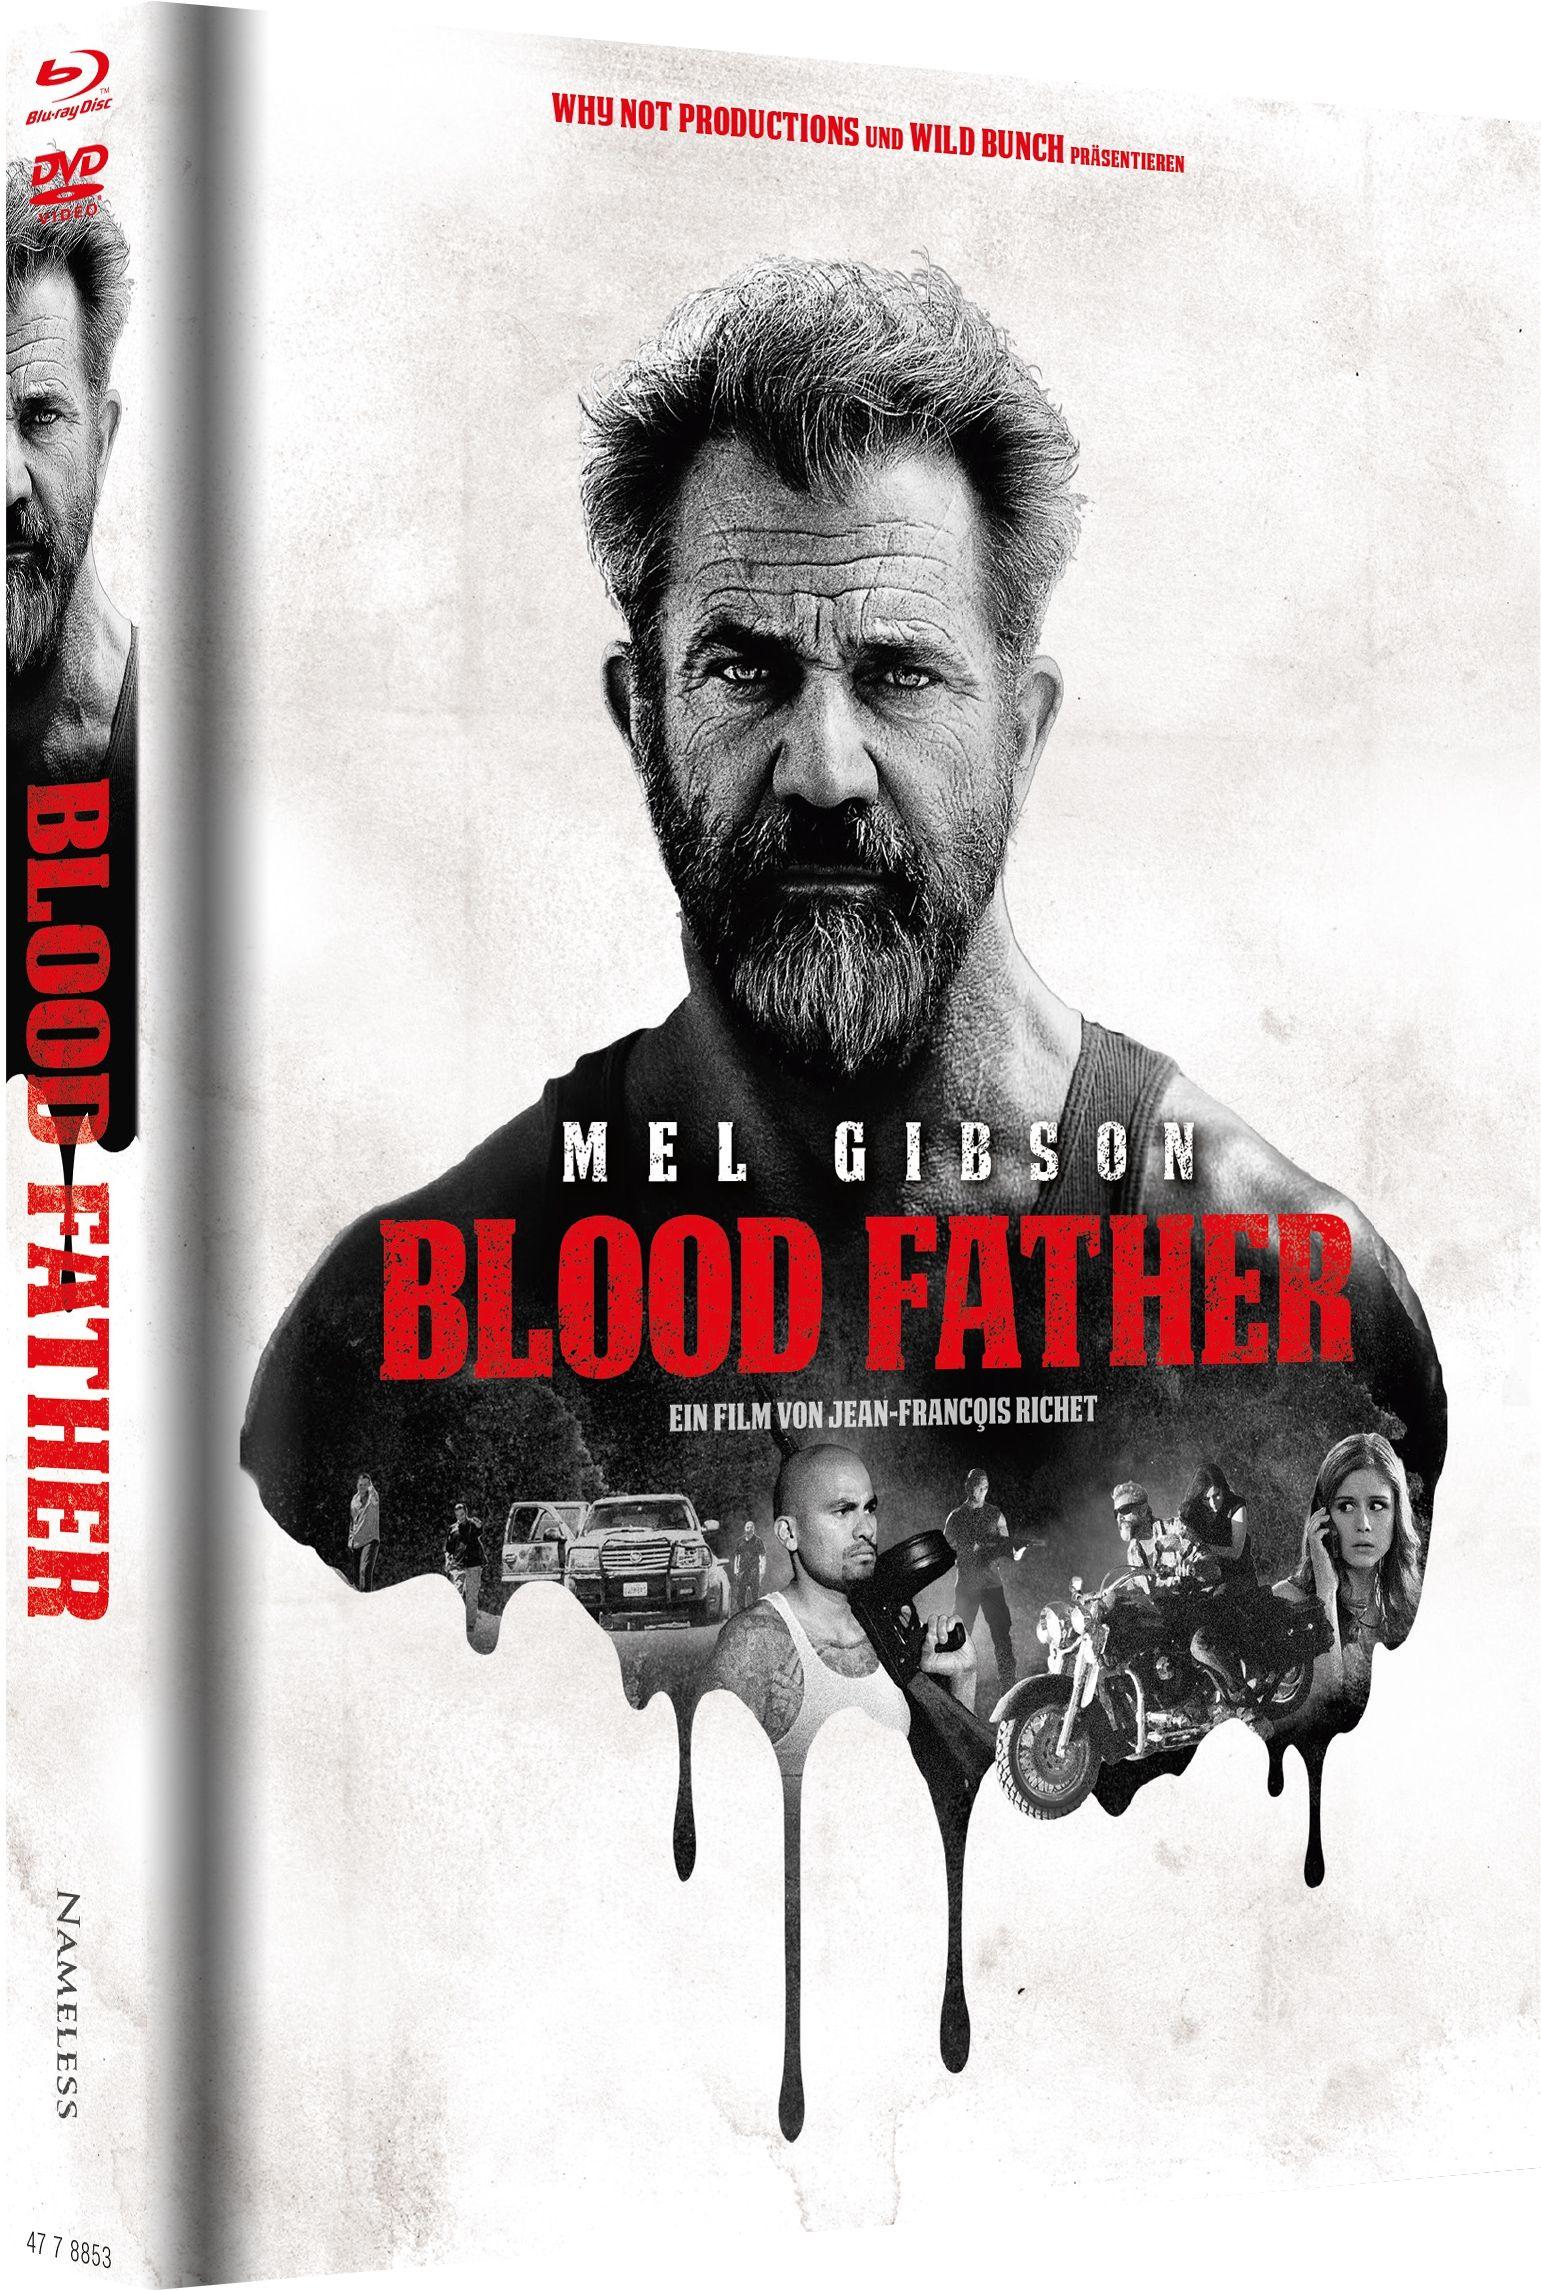 ** B-WARE ** Blood Father (Lim. Uncut Mediabook - Cover A) (DVD + BLURAY) ** B-WARE **